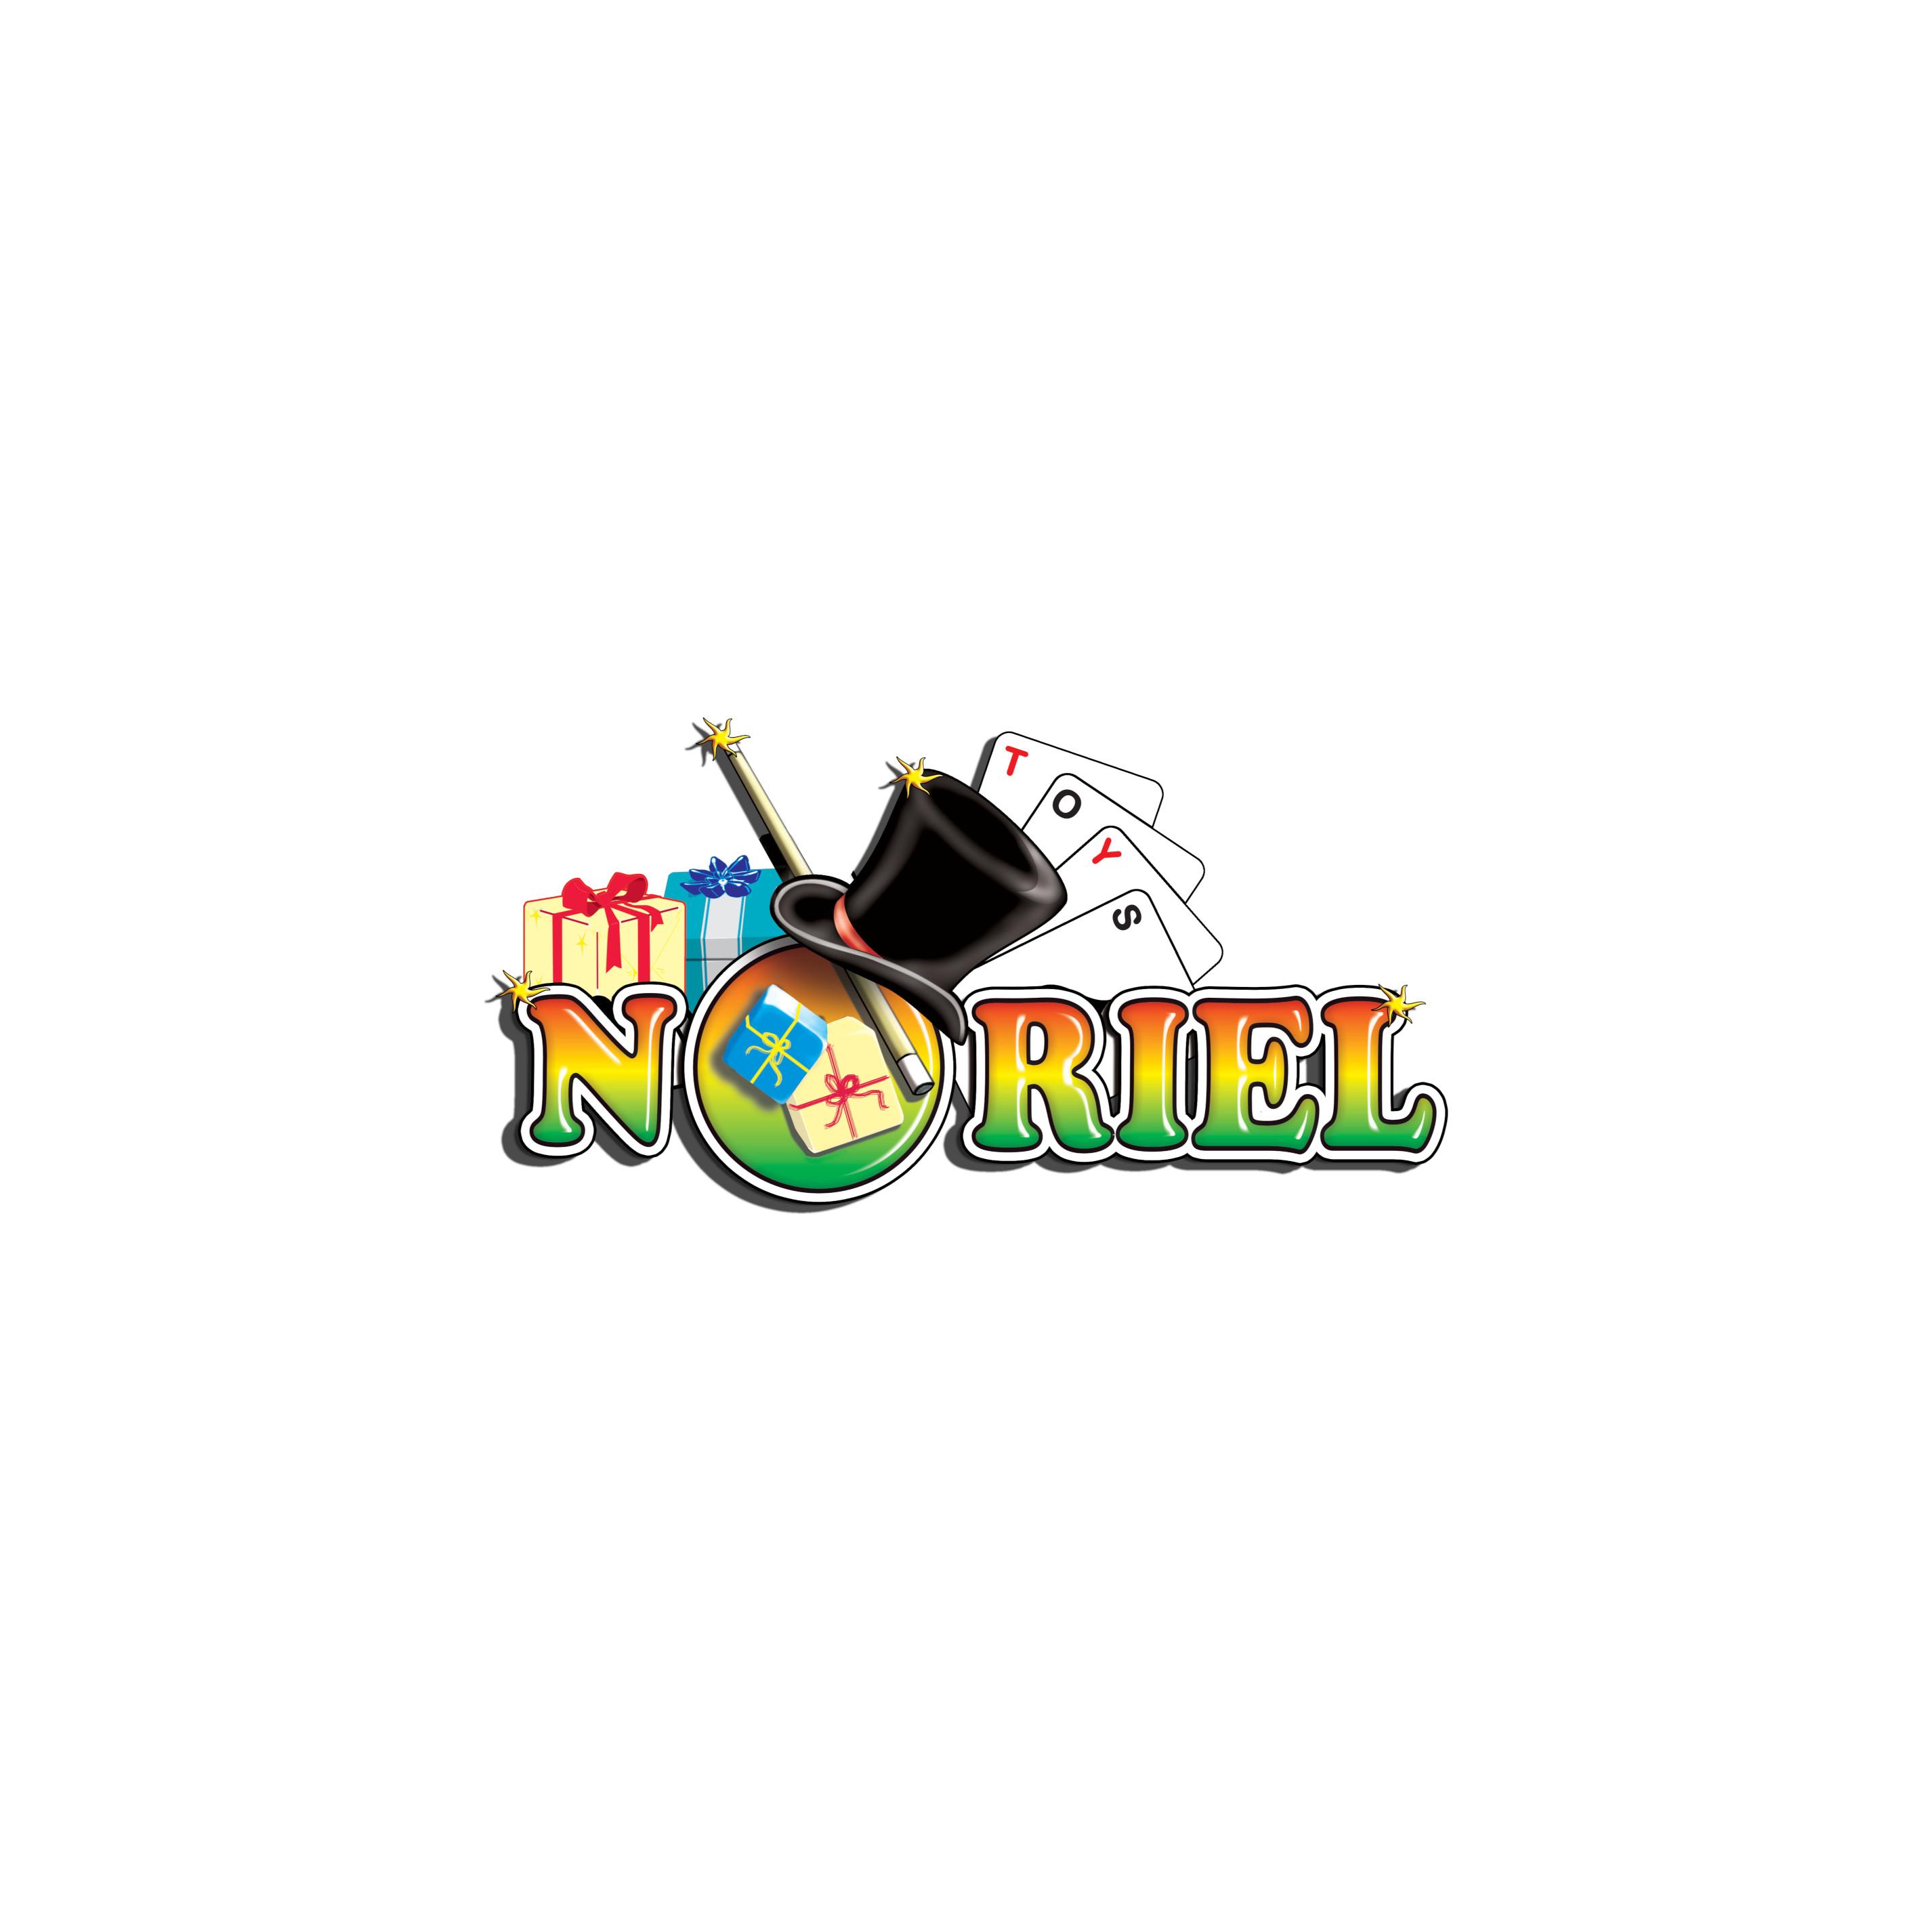 529SCOALU1207_001 Trotineta pliabila DHS Monkey, 120mm, verde-portocaliu